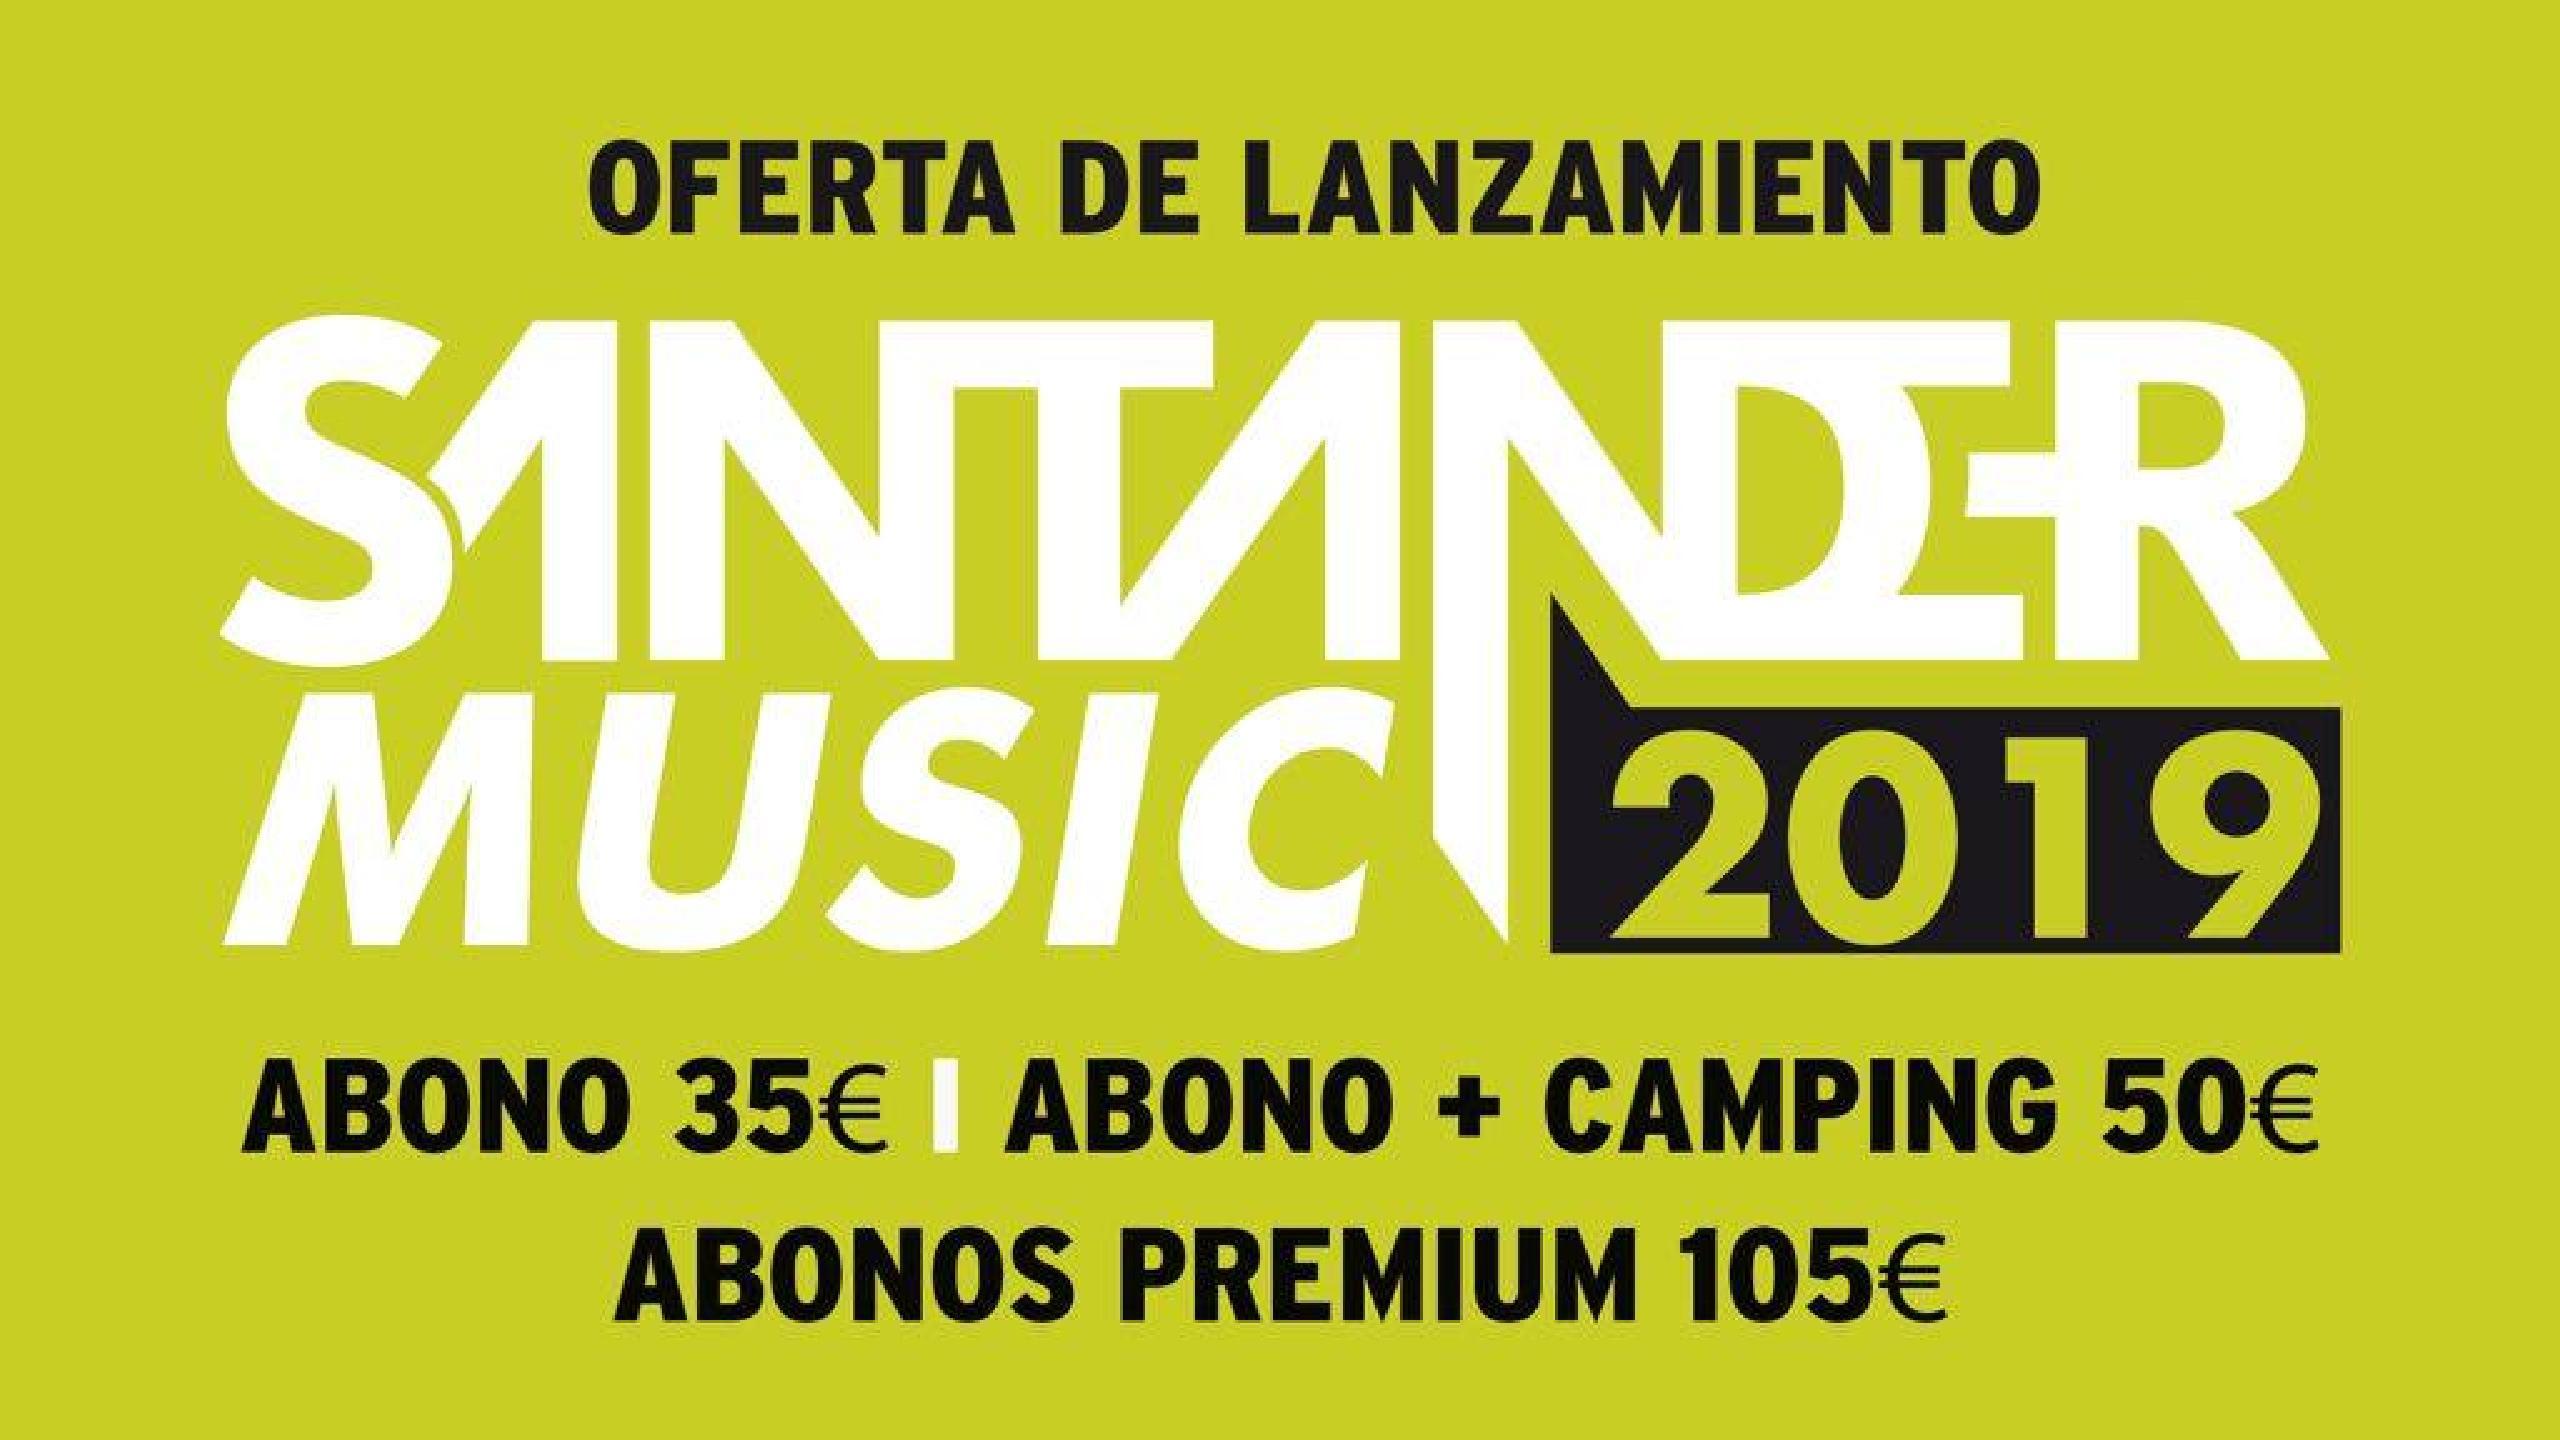 Foto de Santander Music 2019